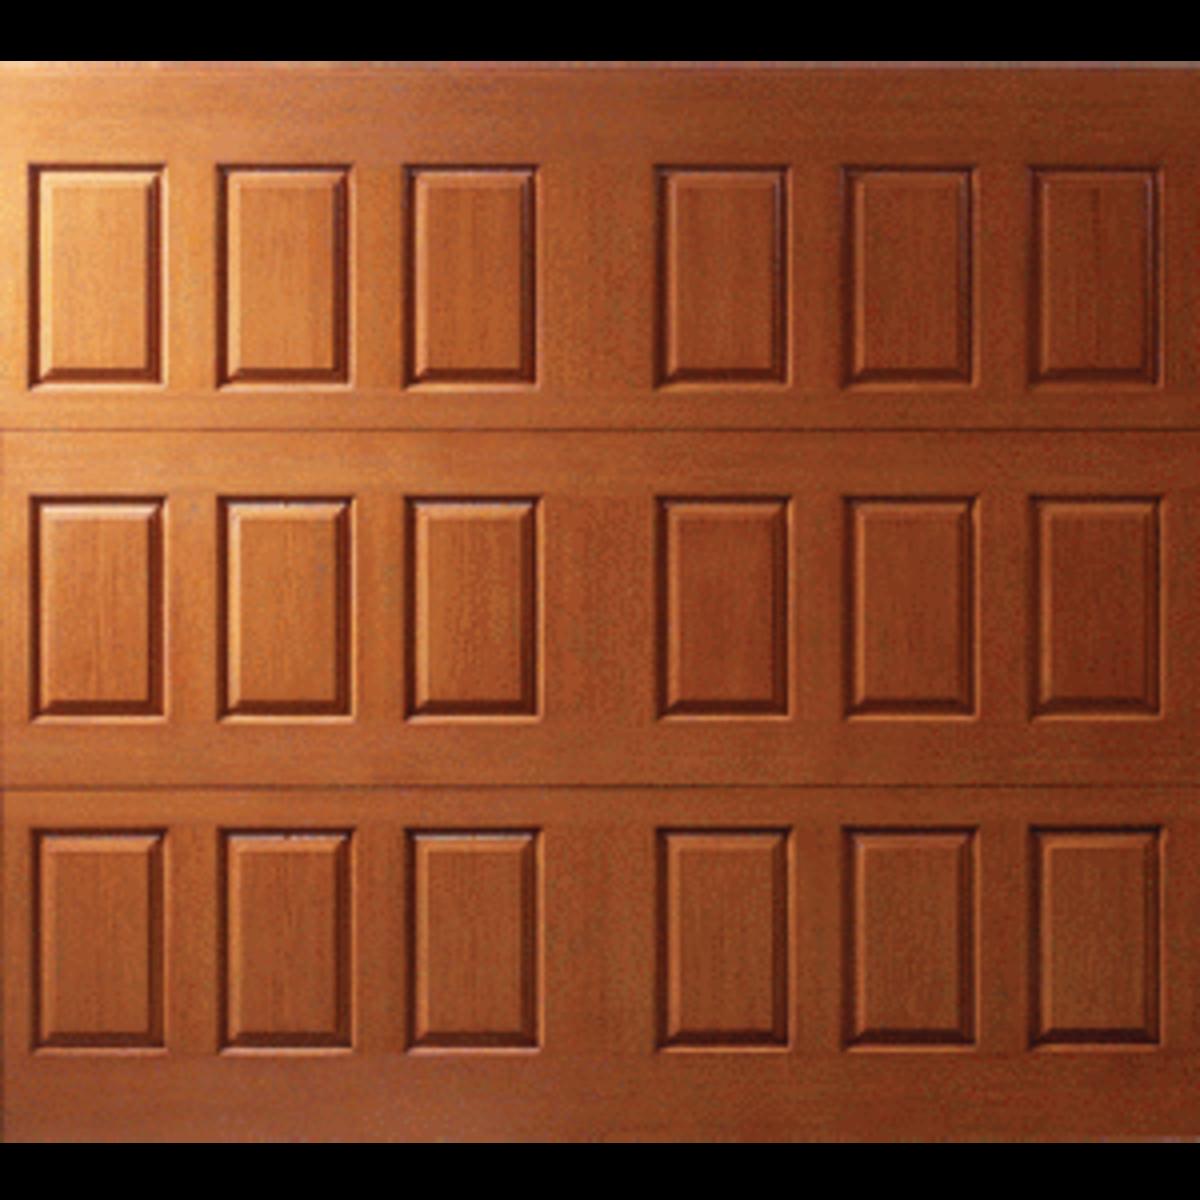 Fiberglass Walnut Garage Door by Wayne Dalton http://directory.qualifiedremodeler.com/product/5302/Wayne-Dalton_Fiberglass-clad_garage_doors